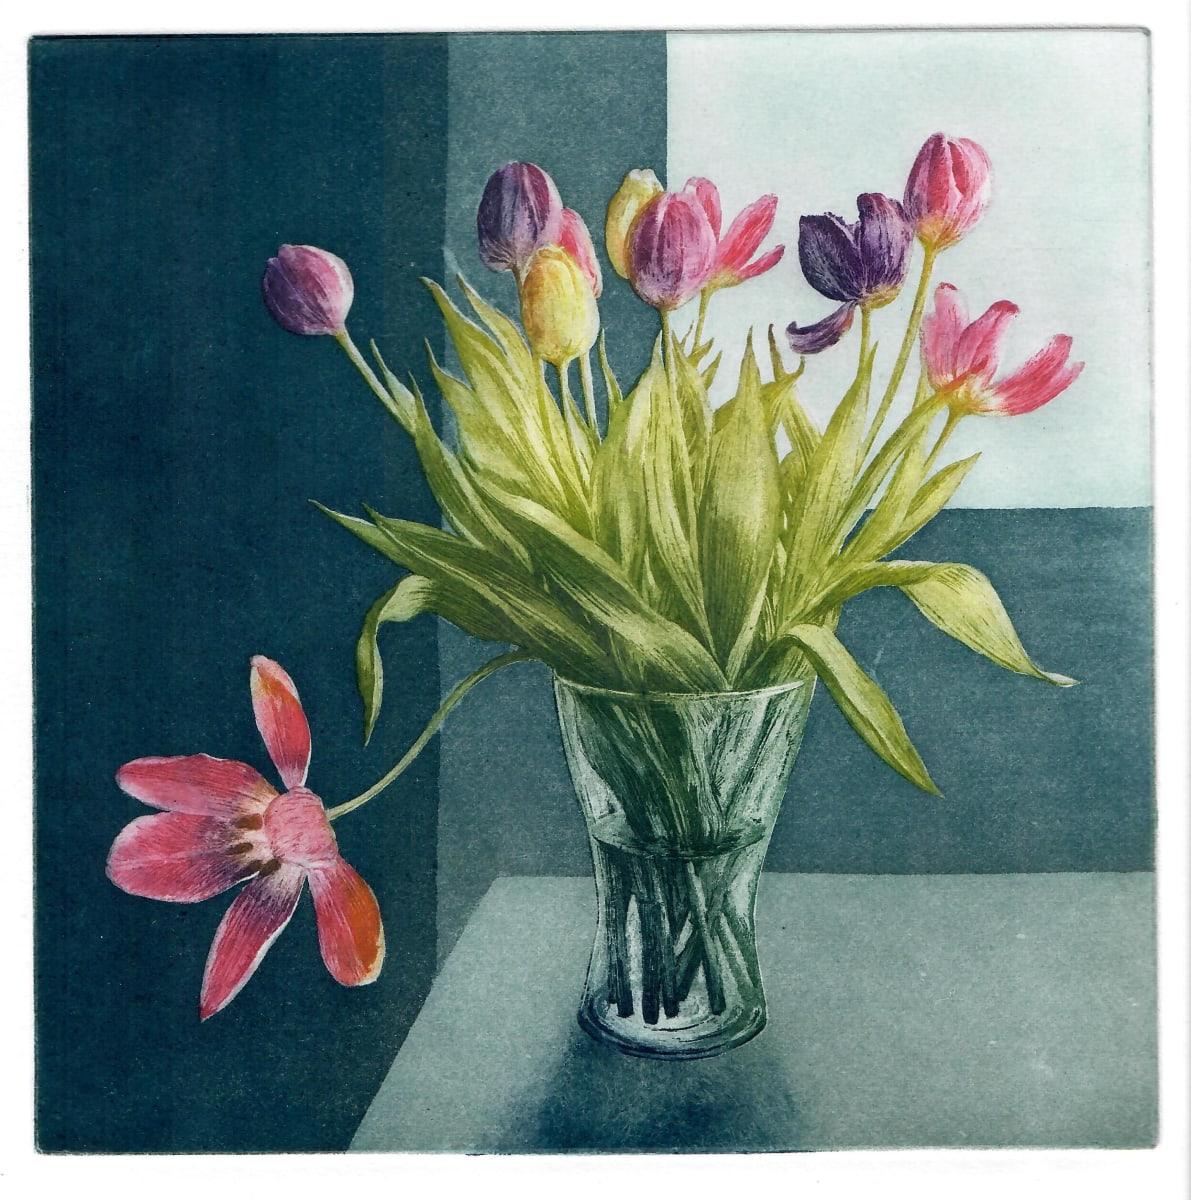 ENT026, Final Flourish by Antonia Enthoven